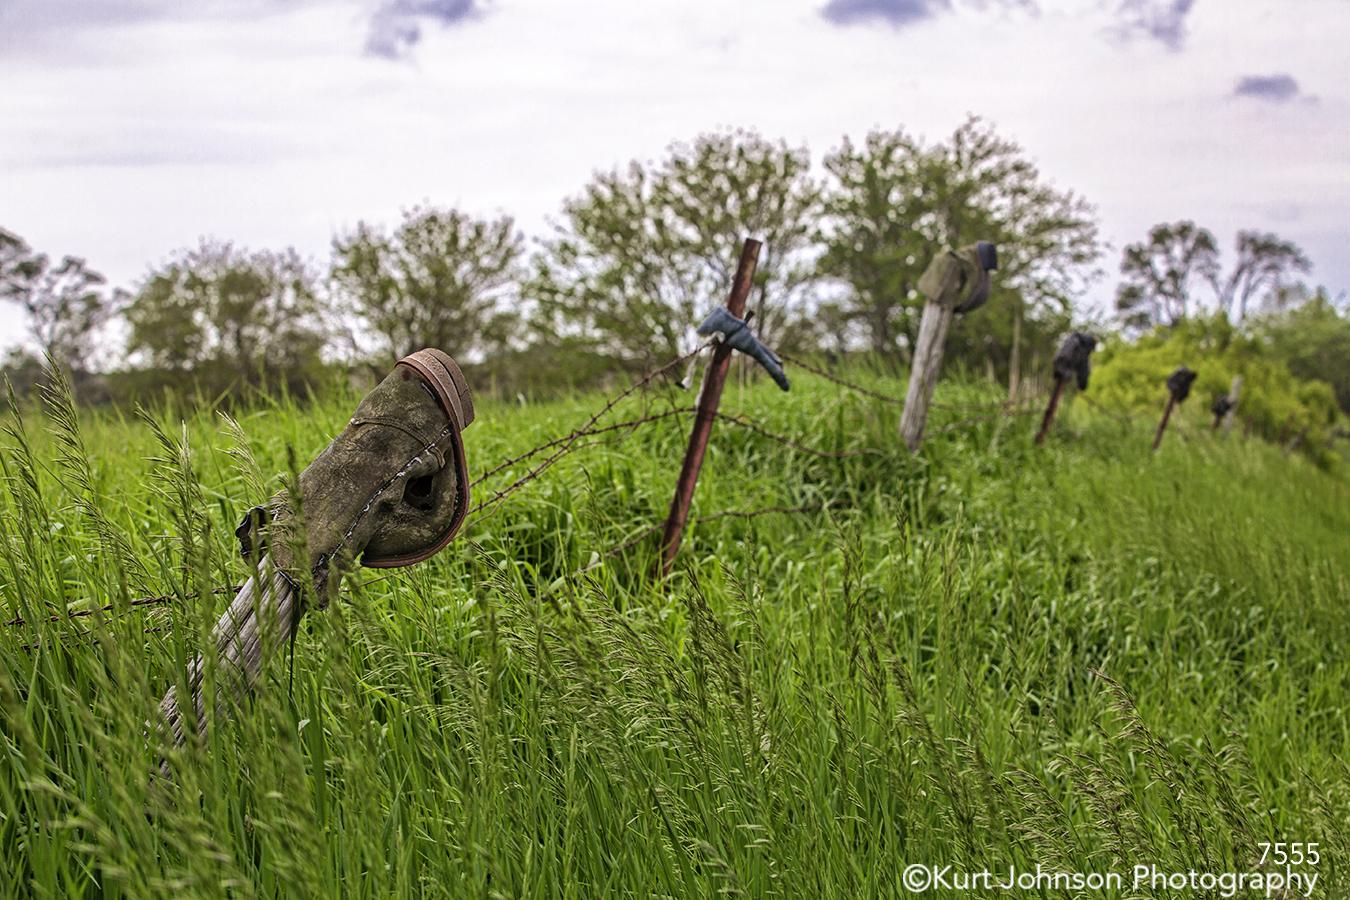 landscape grasses green rural fence boots